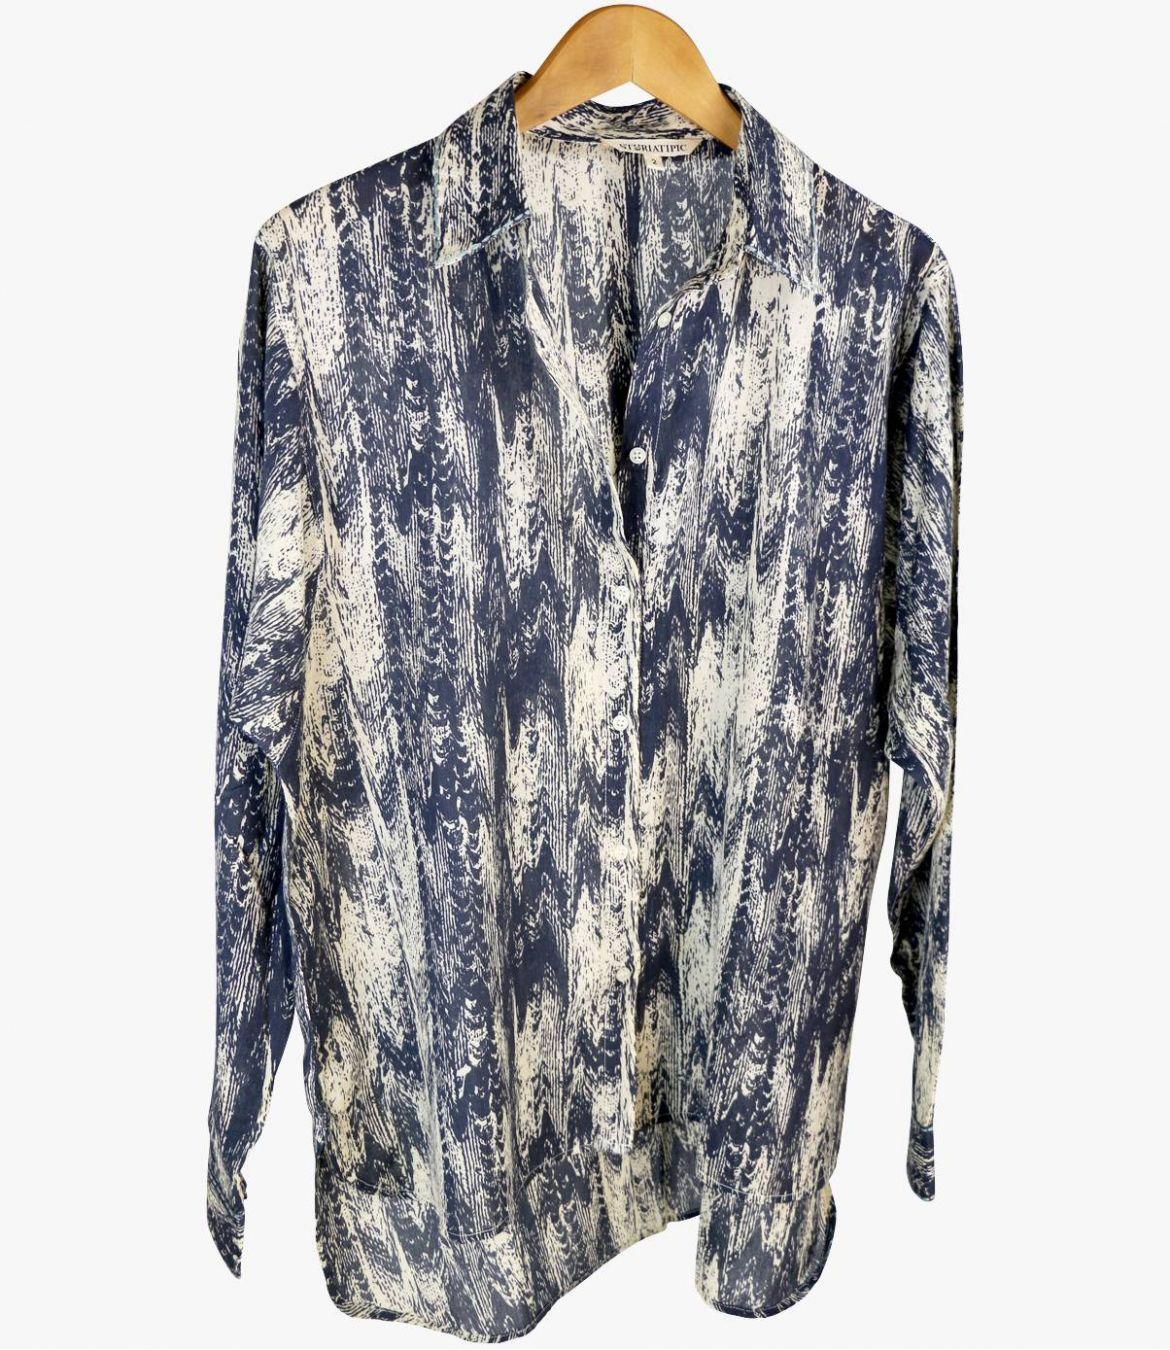 COSY MOIRA Cotton Shirt for Women Storiatipic - 5